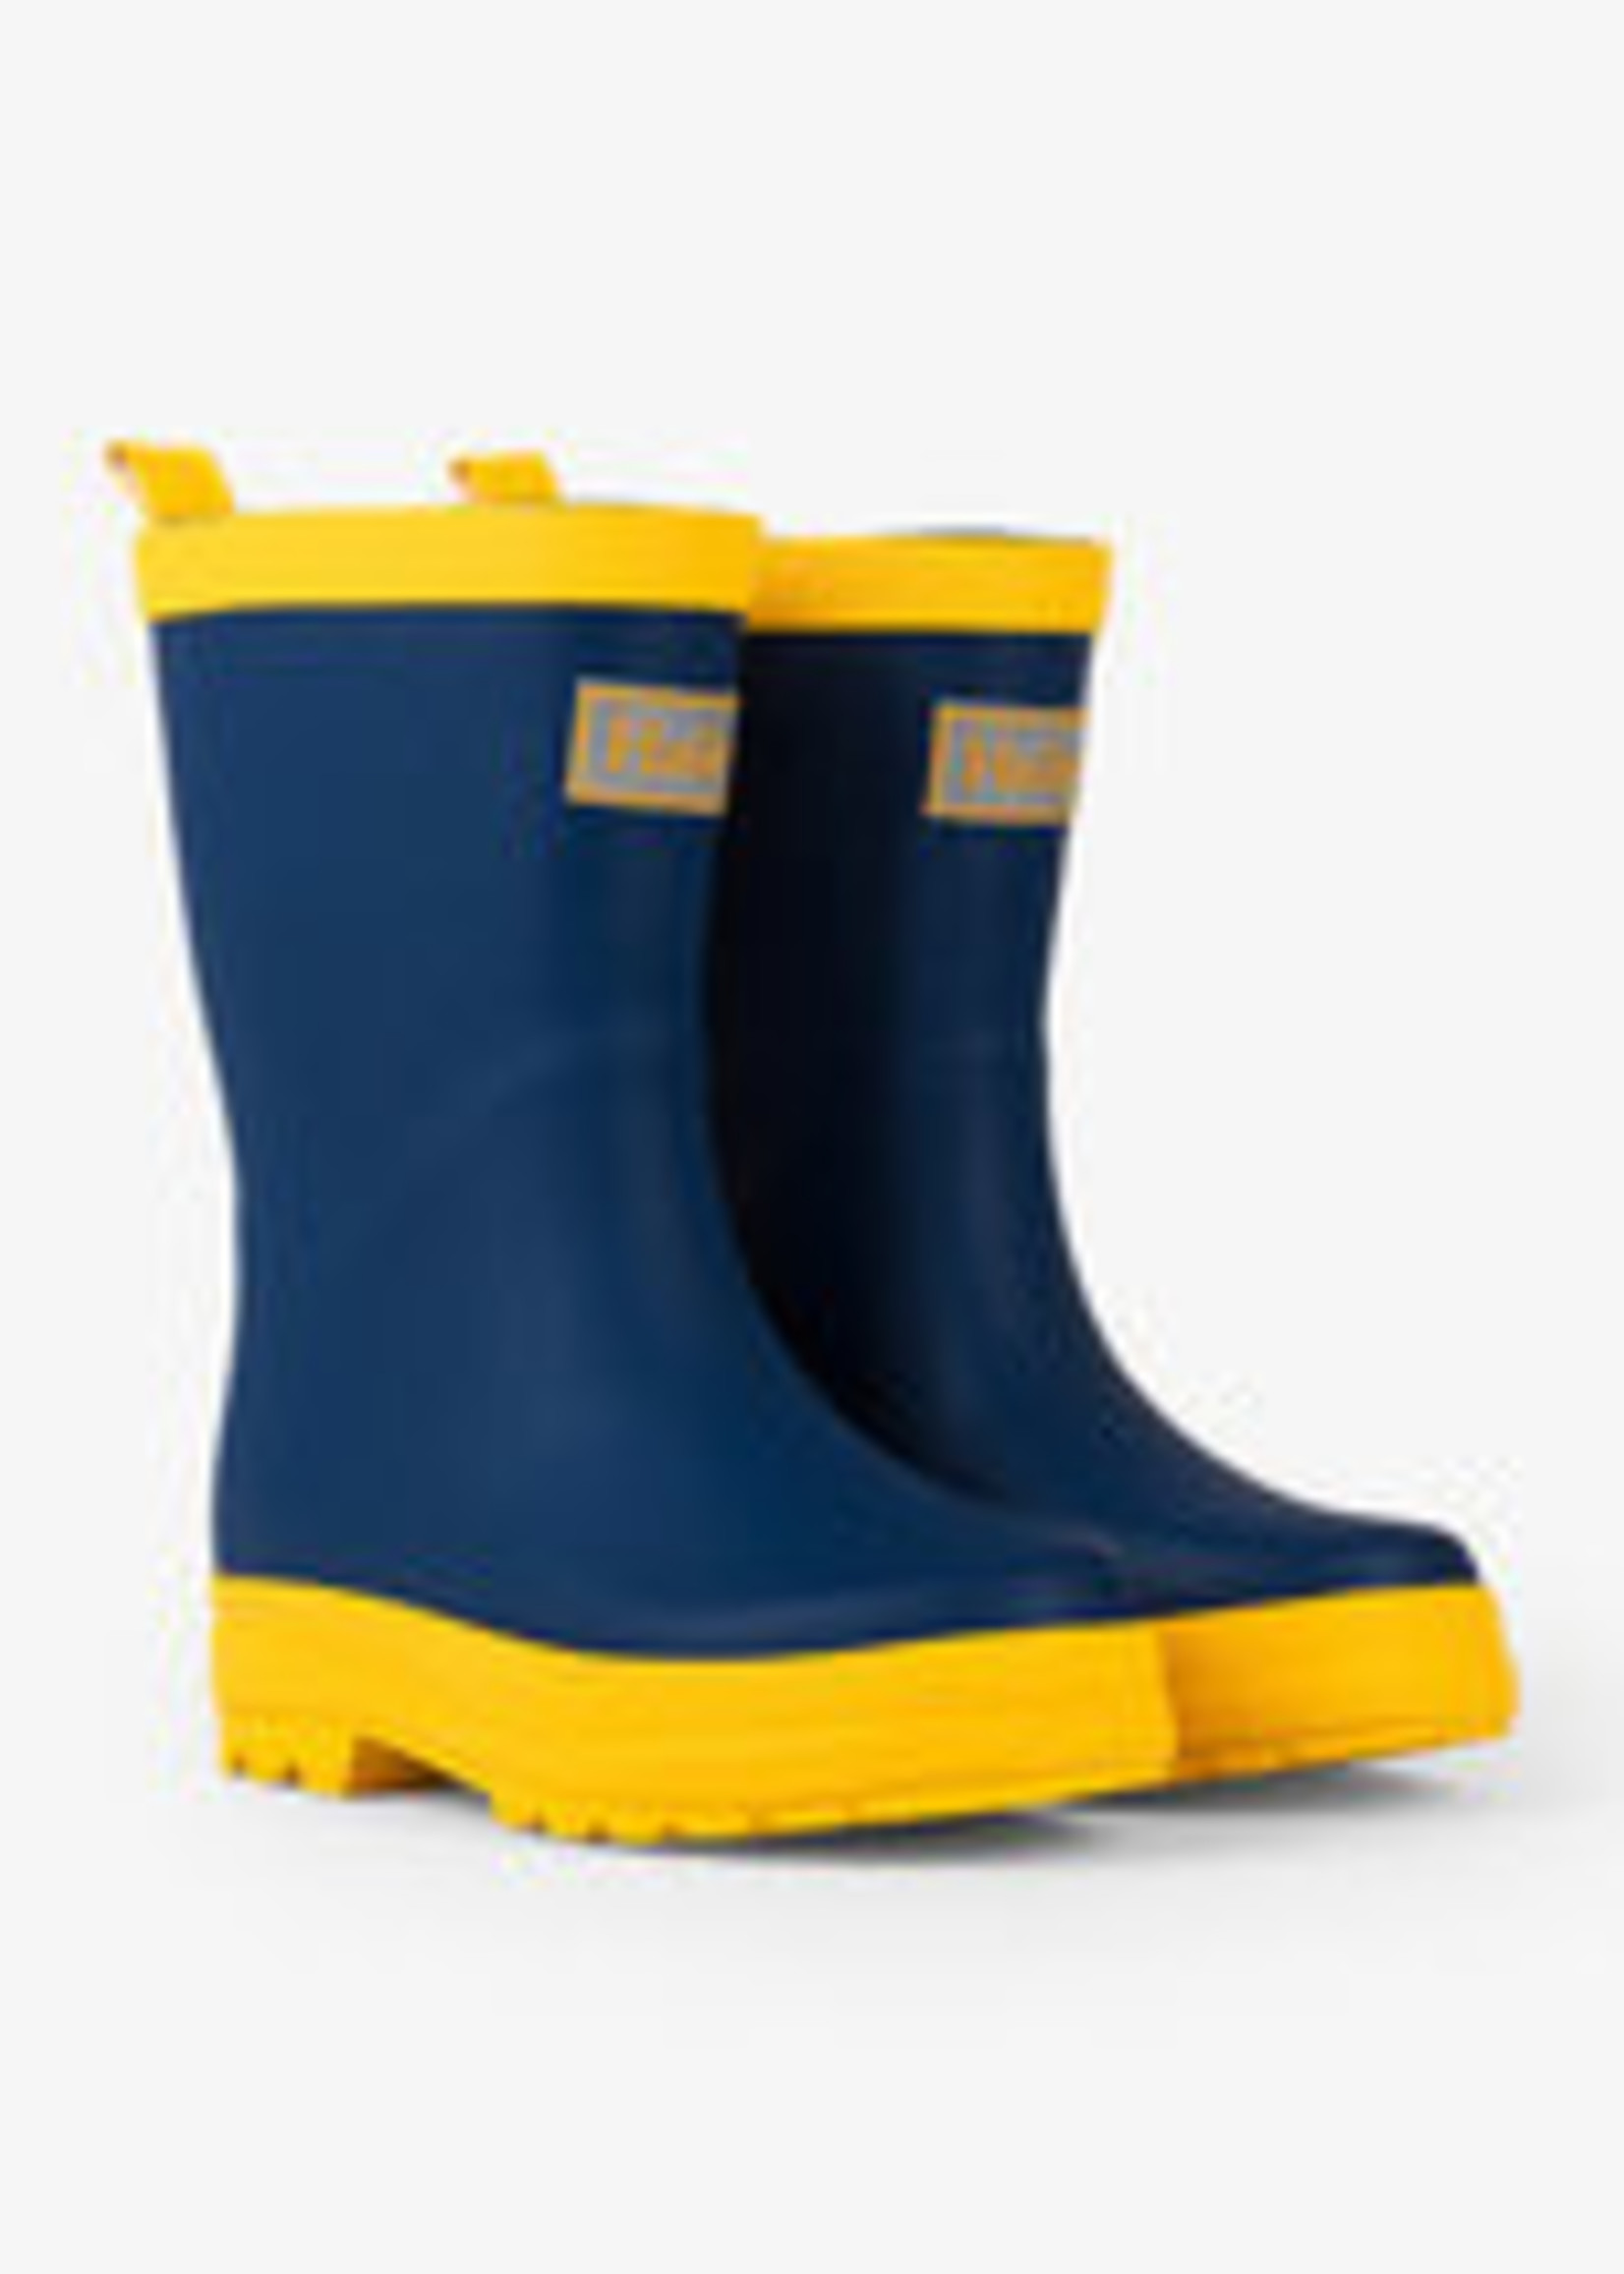 Hatley NAVY & YELLOW RAIN BOOTS RB0NAVY346